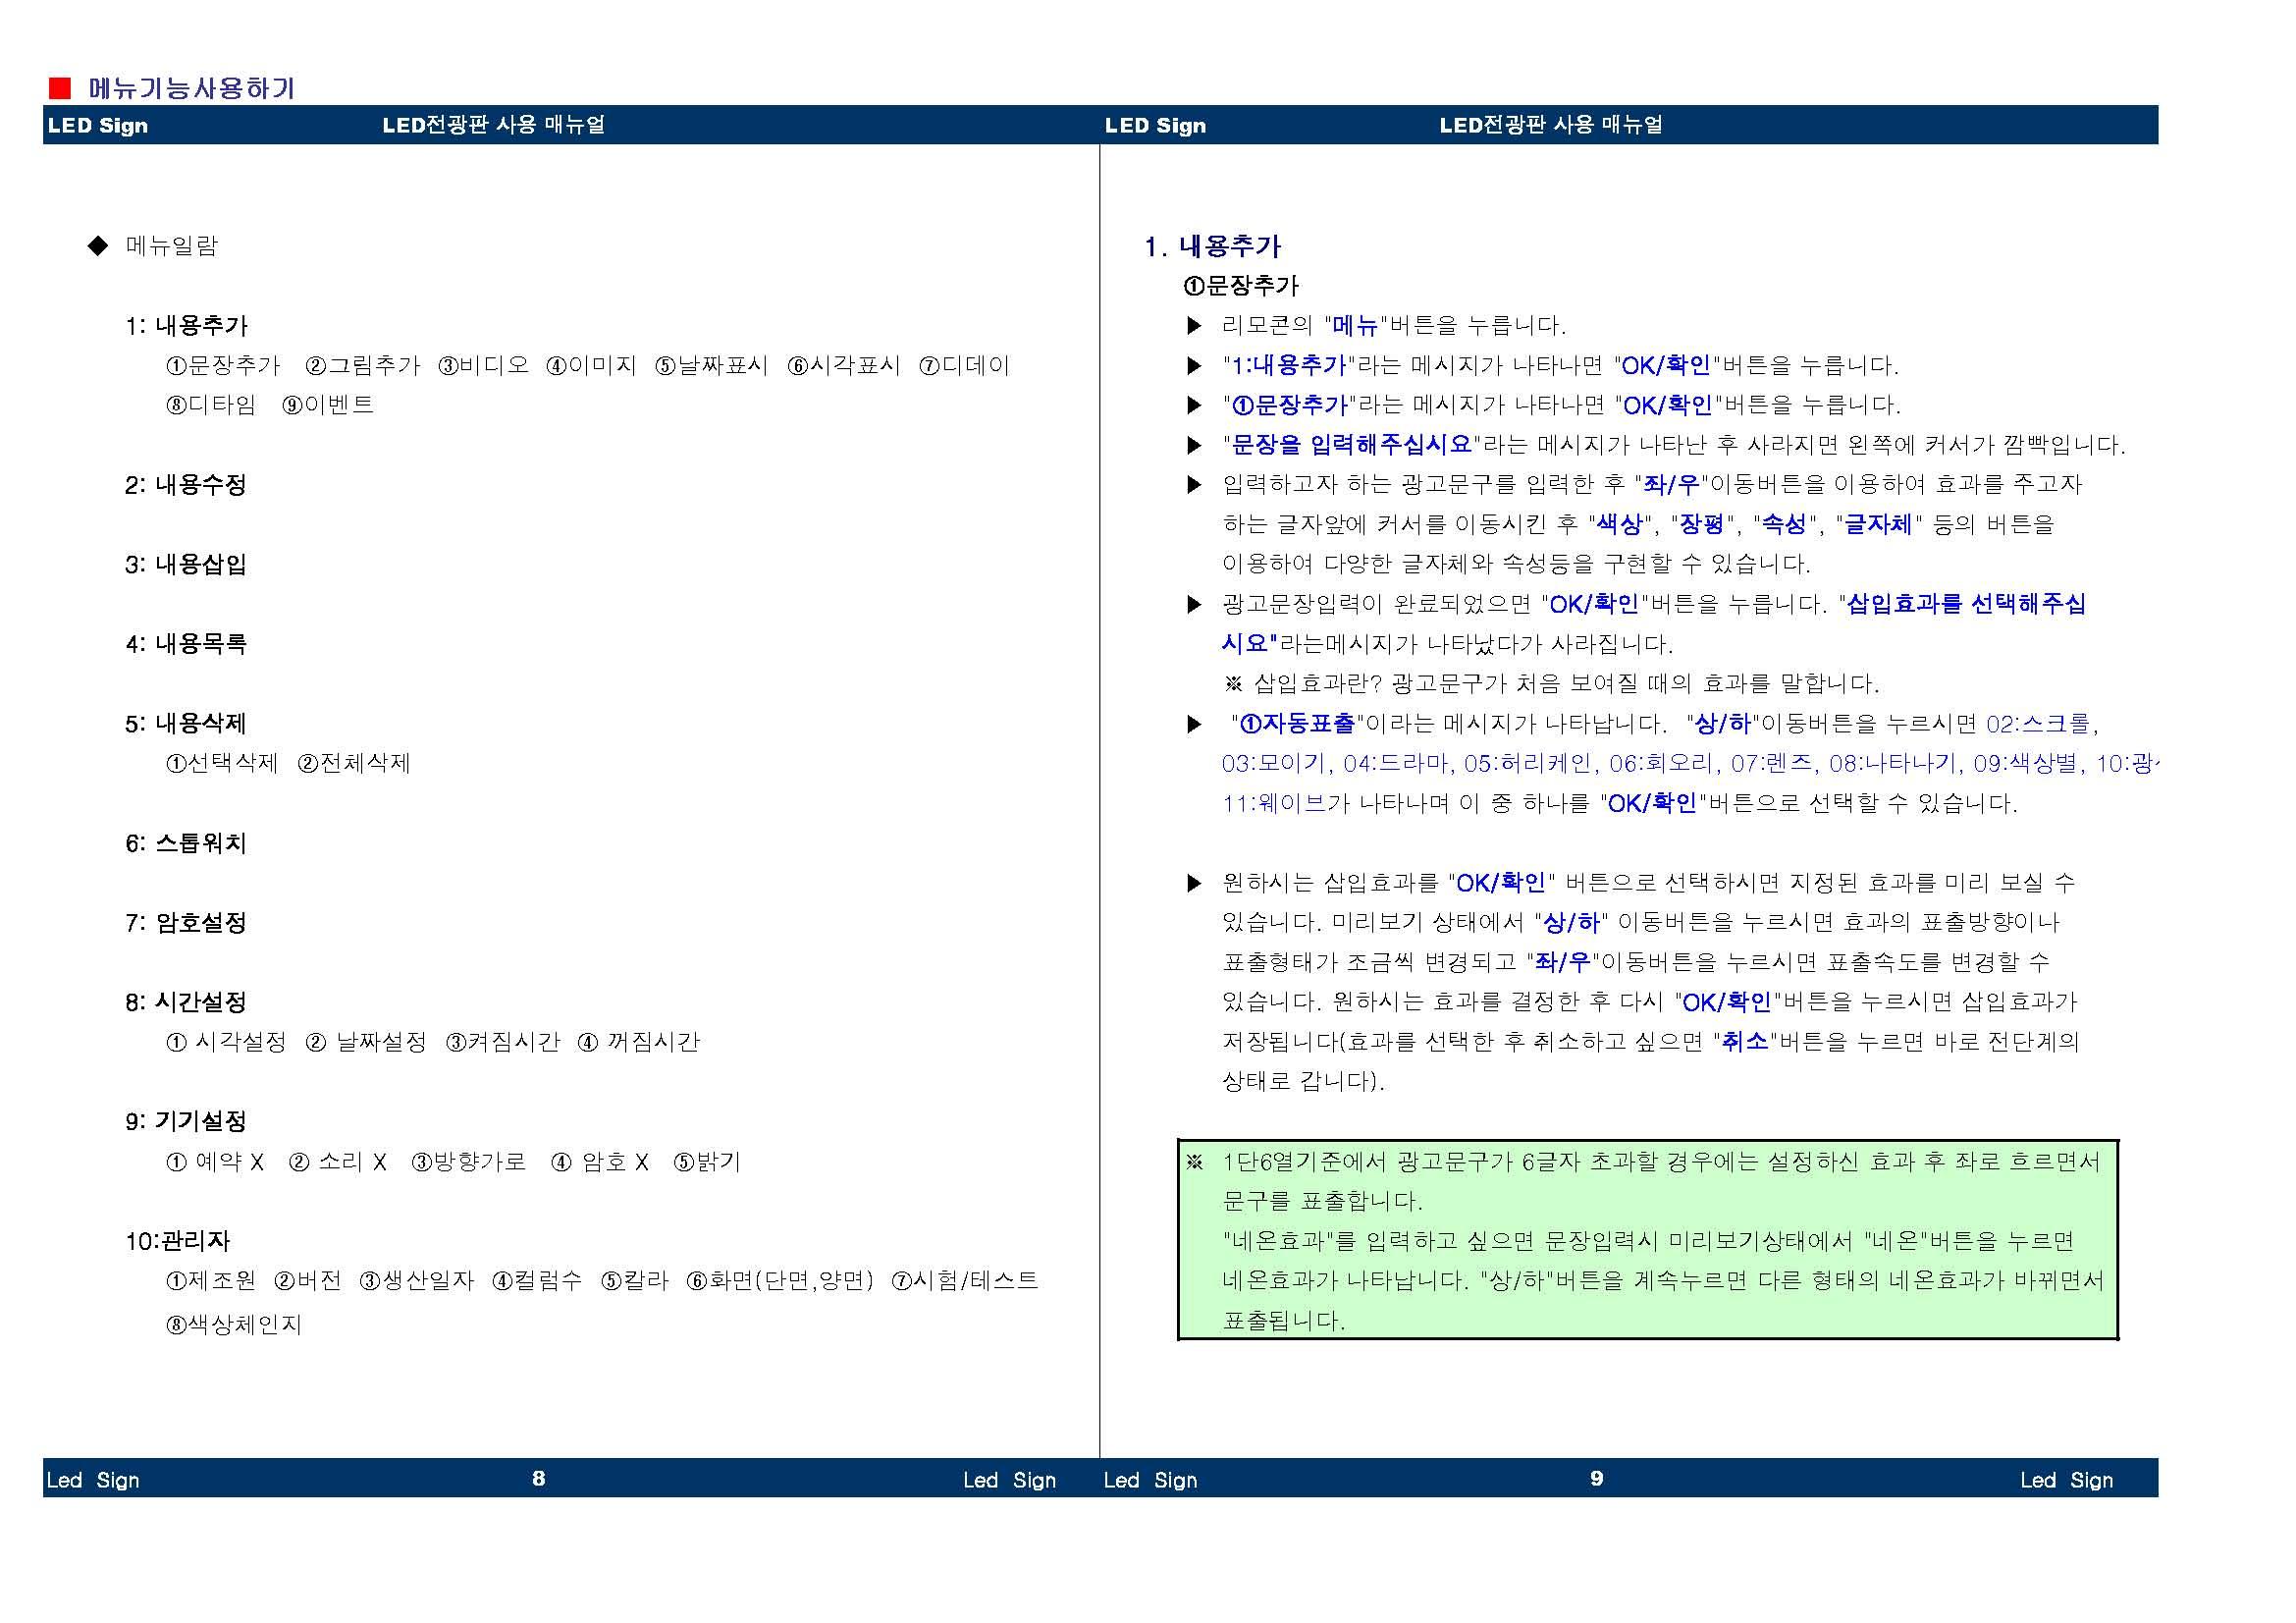 LedSign사용설명서_페이지_04.jpg